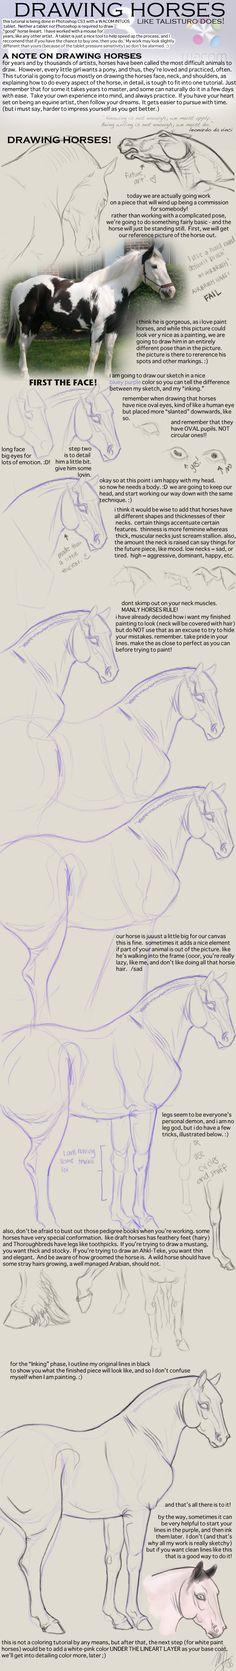 How to Draw Realistic Horses by Talisturo.deviantart.com on @deviantART